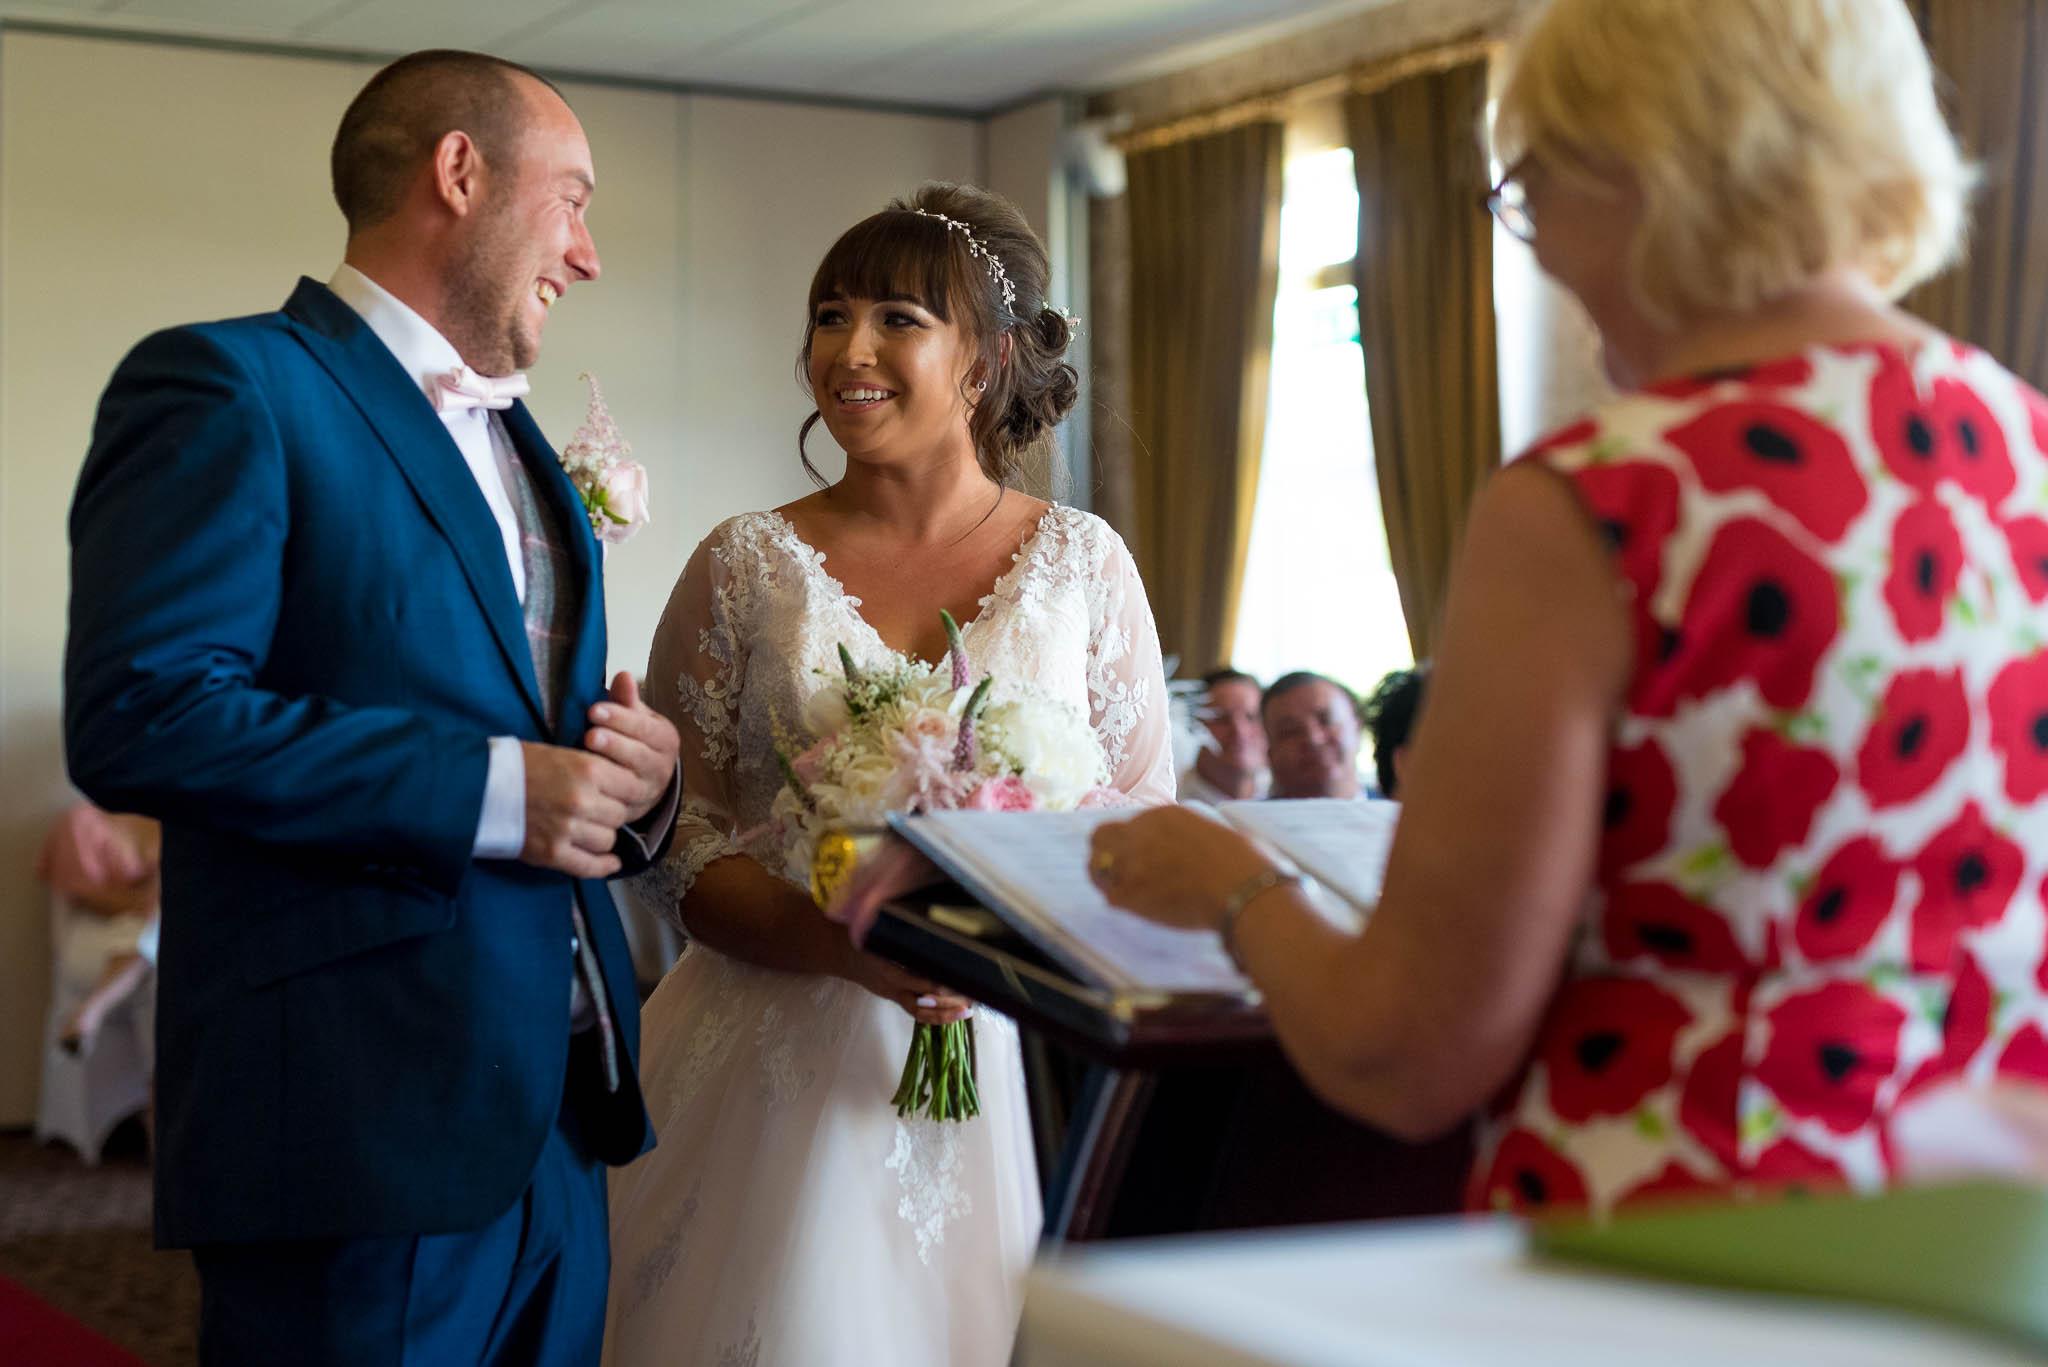 Darrington Golf Club Wedding Photographer73.jpg